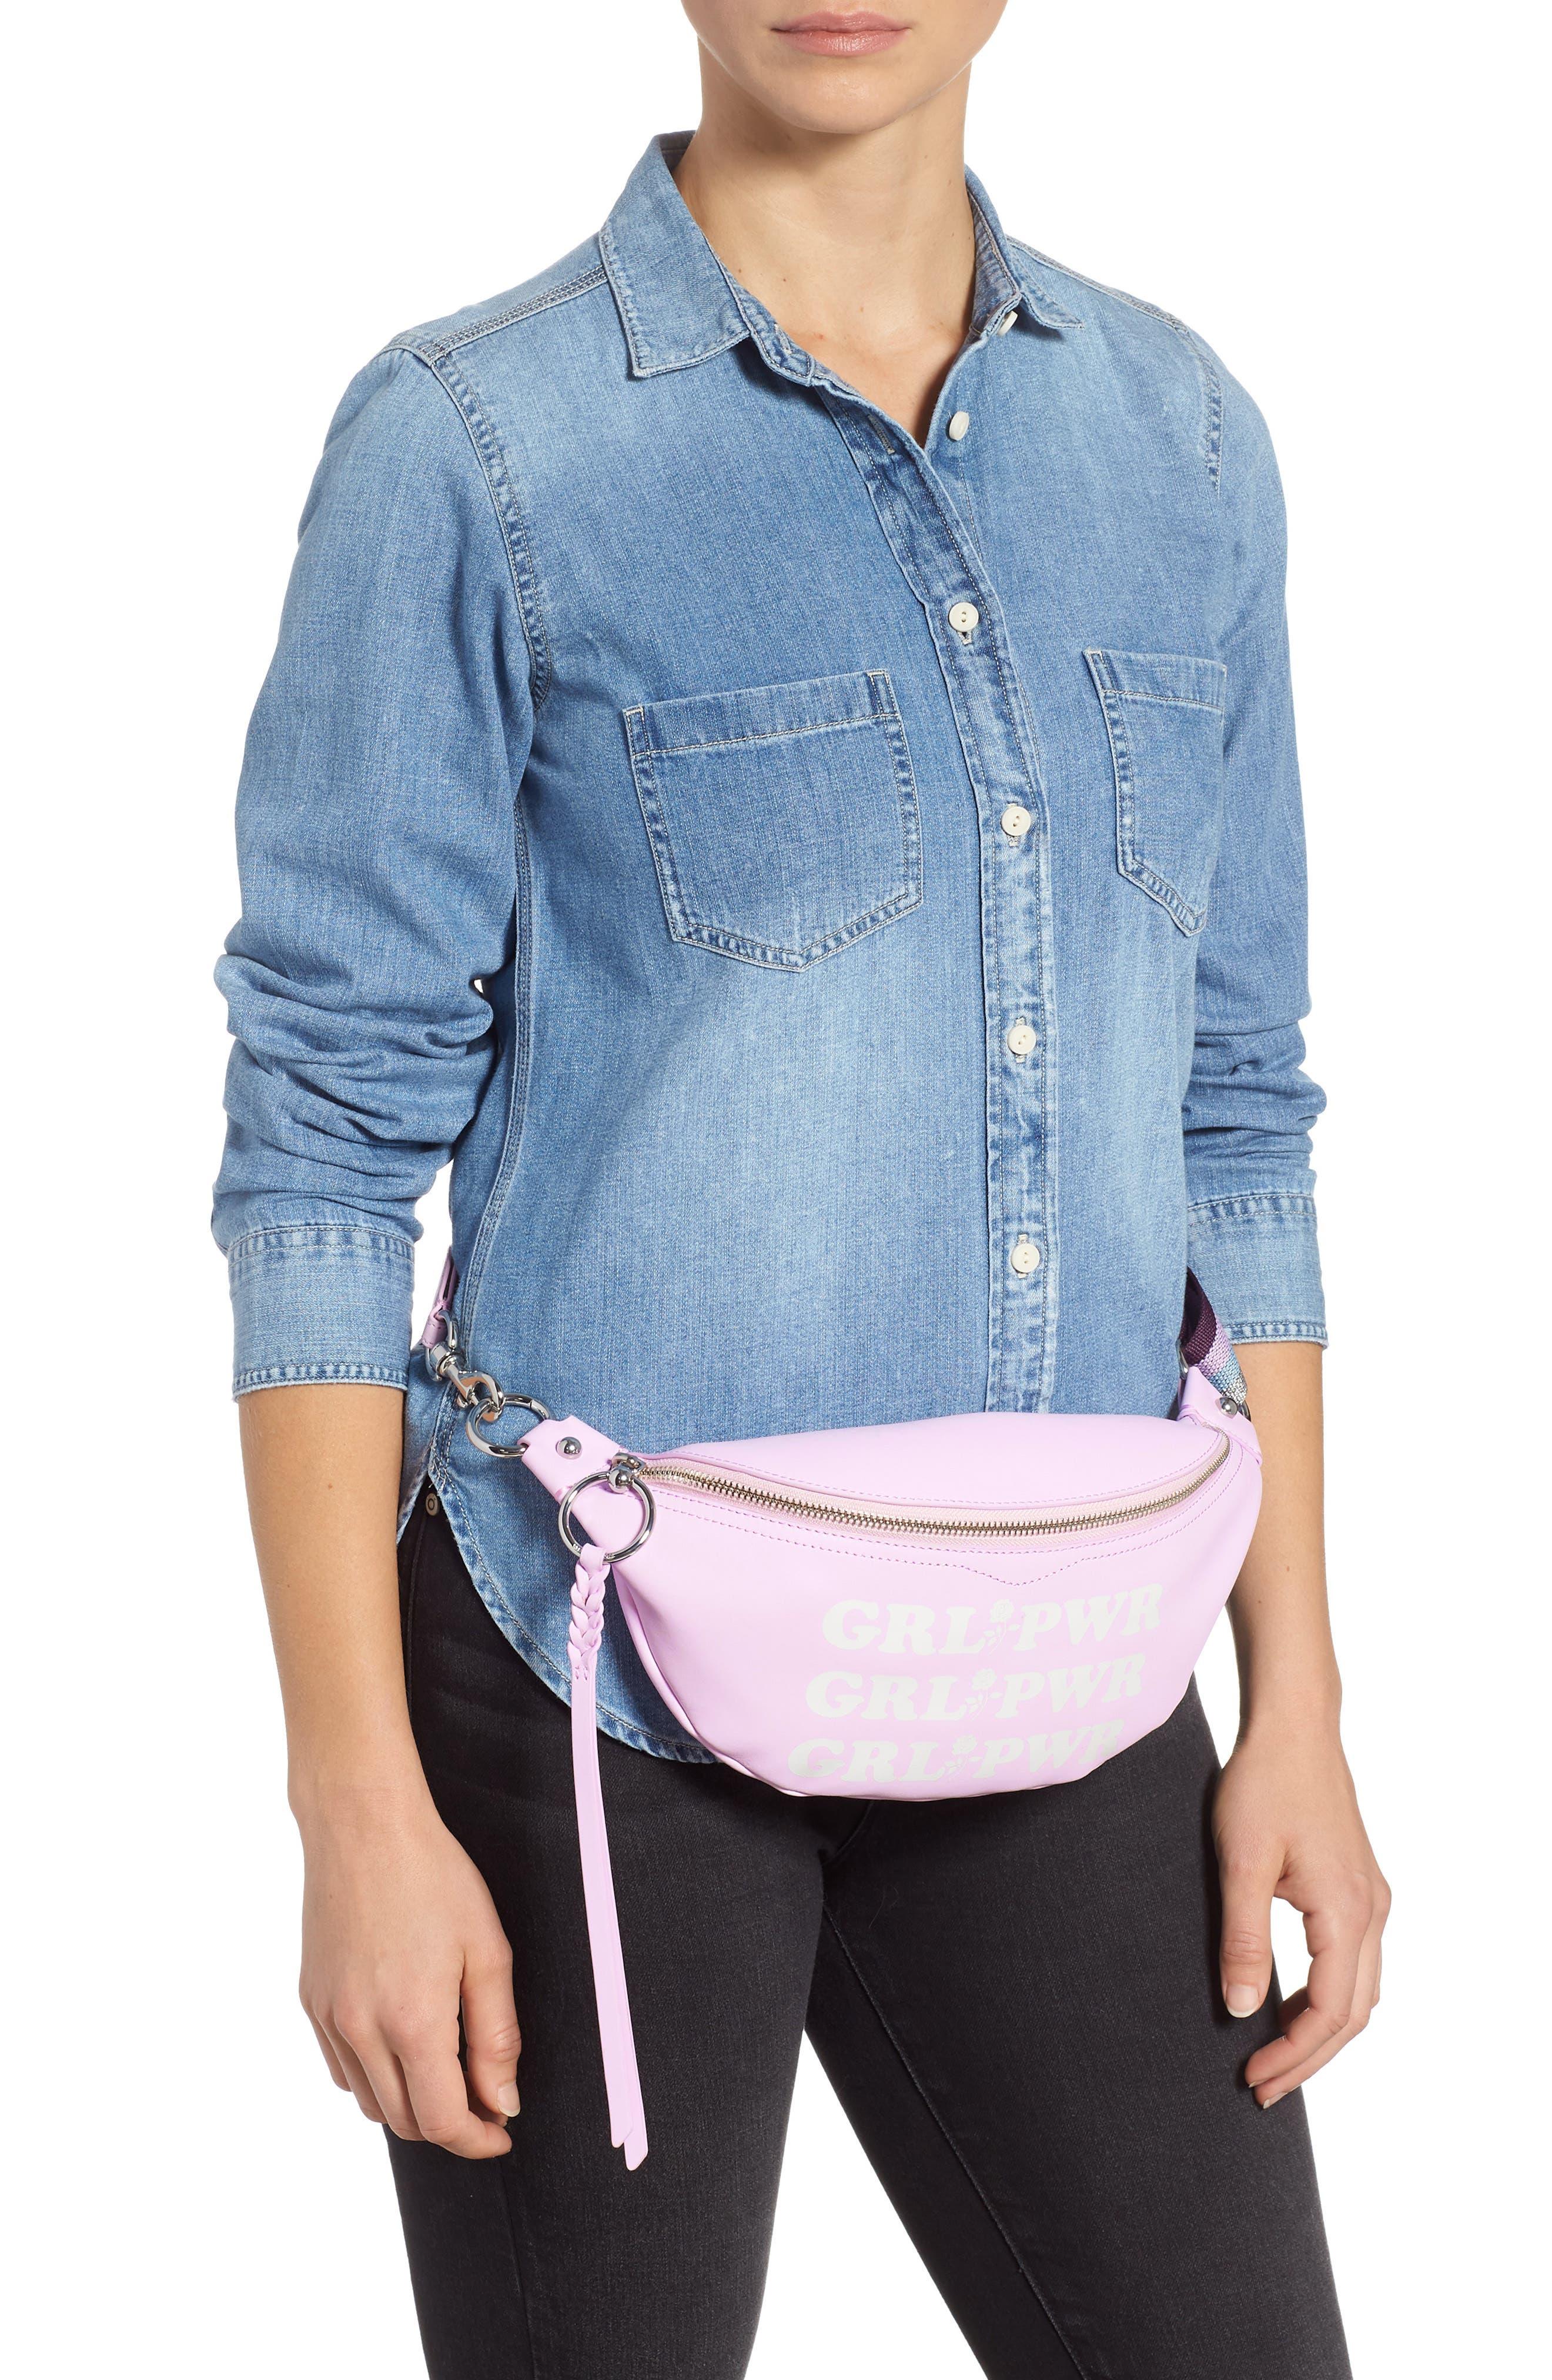 REBECCA MINKOFF,                             Bree - GRL PWR Leather Belt Bag,                             Alternate thumbnail 2, color,                             500